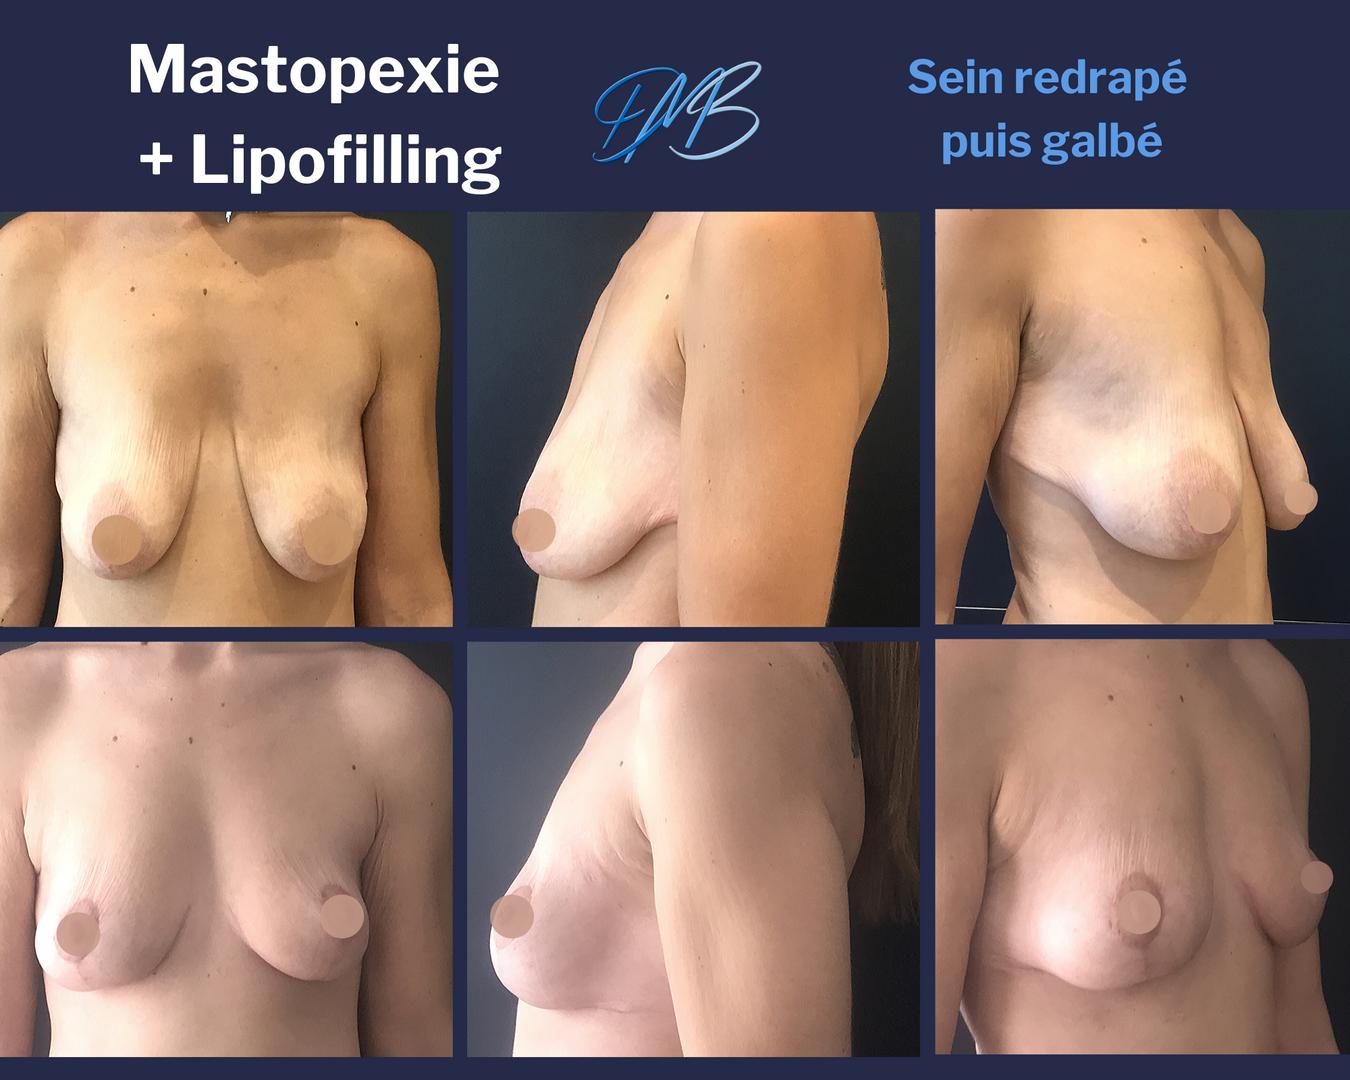 Mastopexie + lipofilling